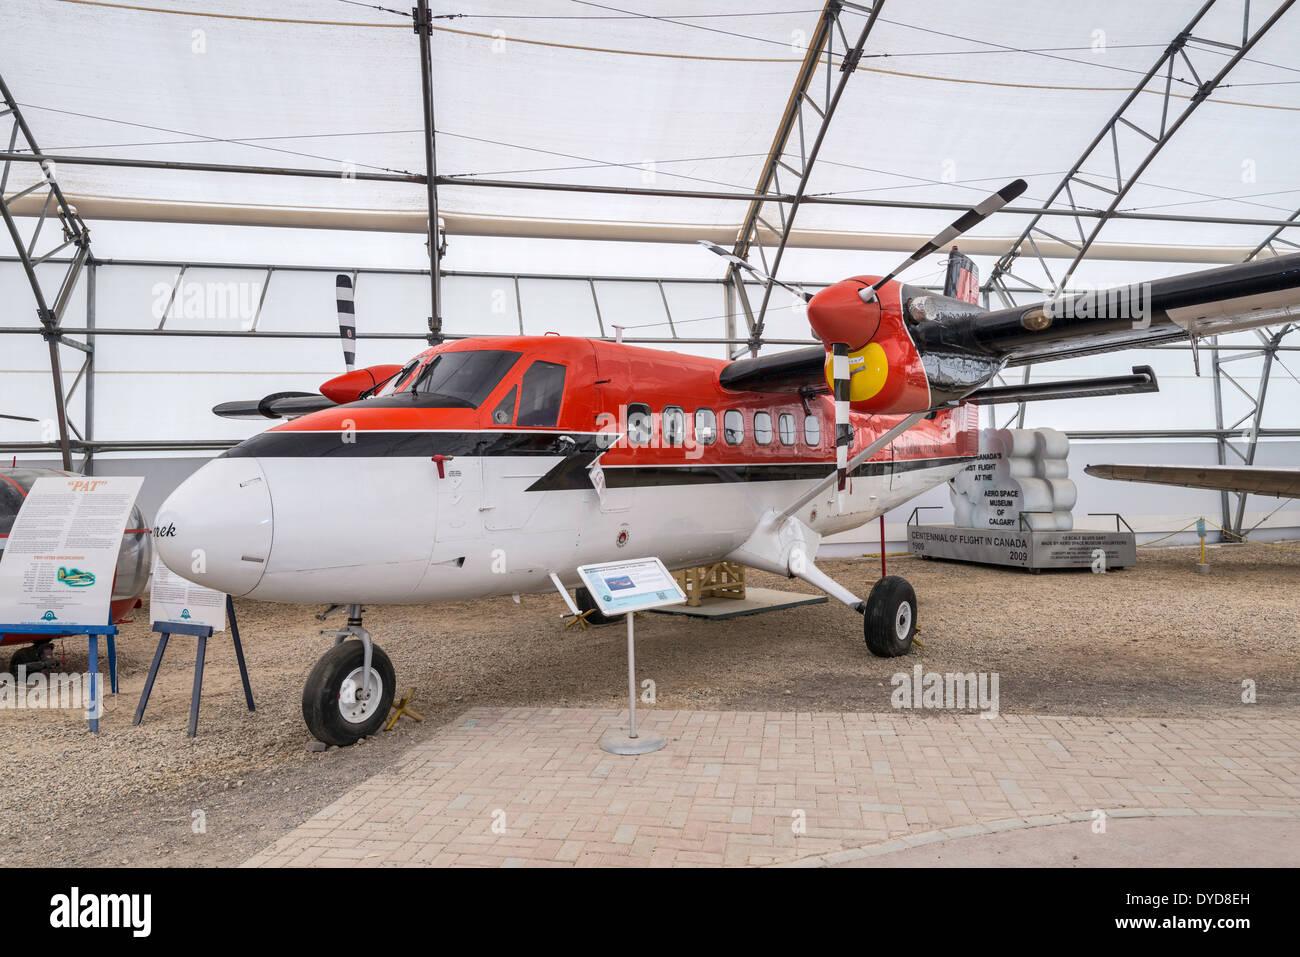 de Havilland Canada DHC-6 Twin Otter utility aircraft, Tent Hangar at Aero Space Museum, Calgary, Alberta, Canada - Stock Image